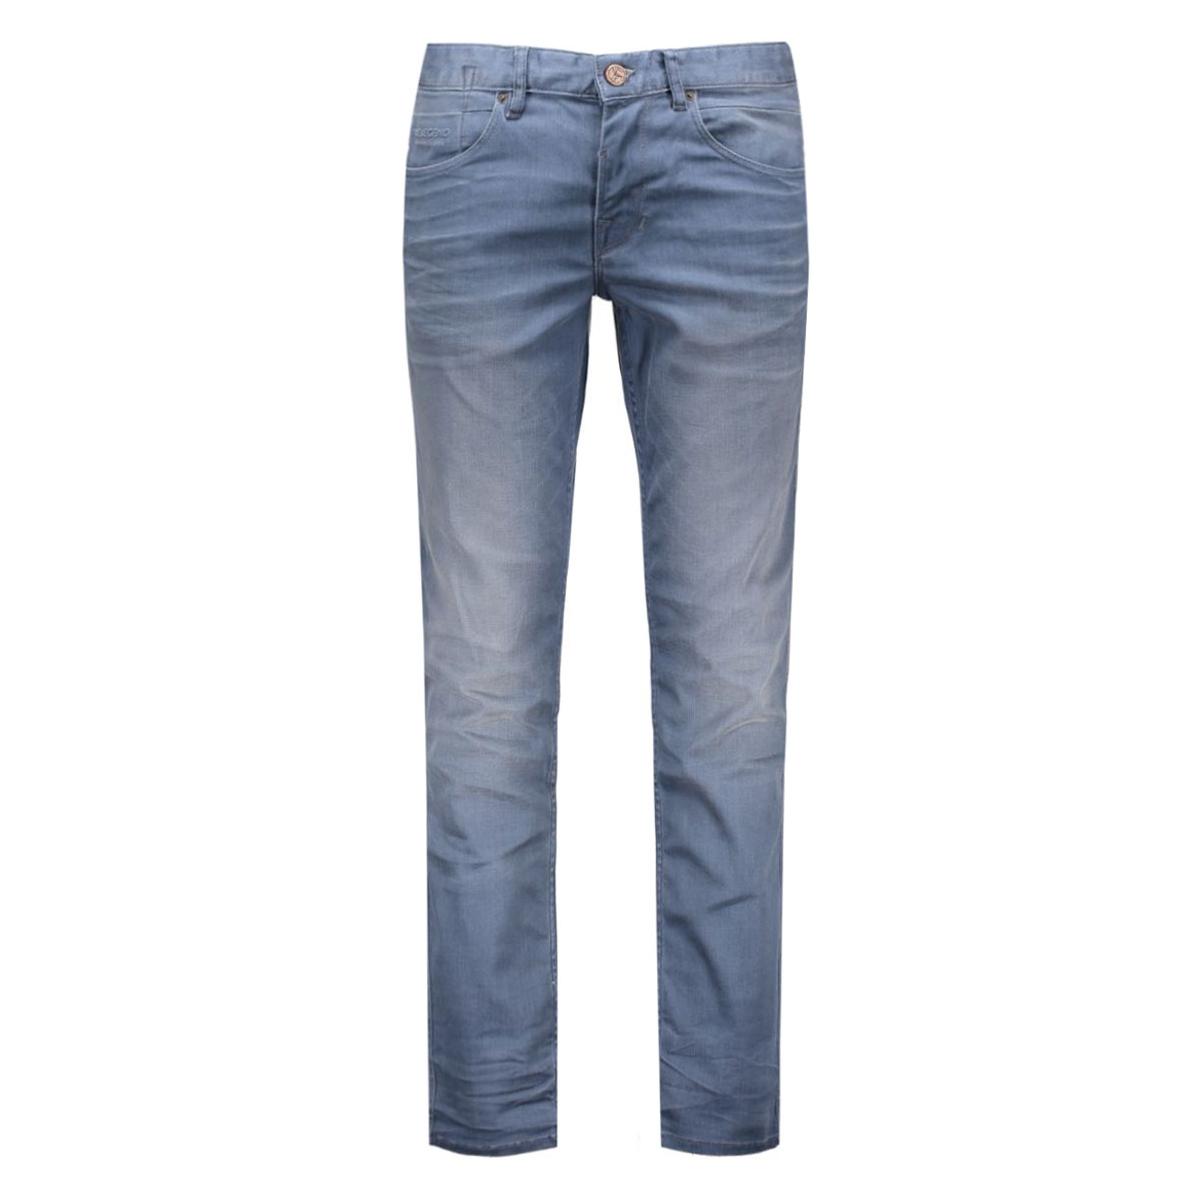 nightflight stretch denim ptr66126 pme legend jeans sgs